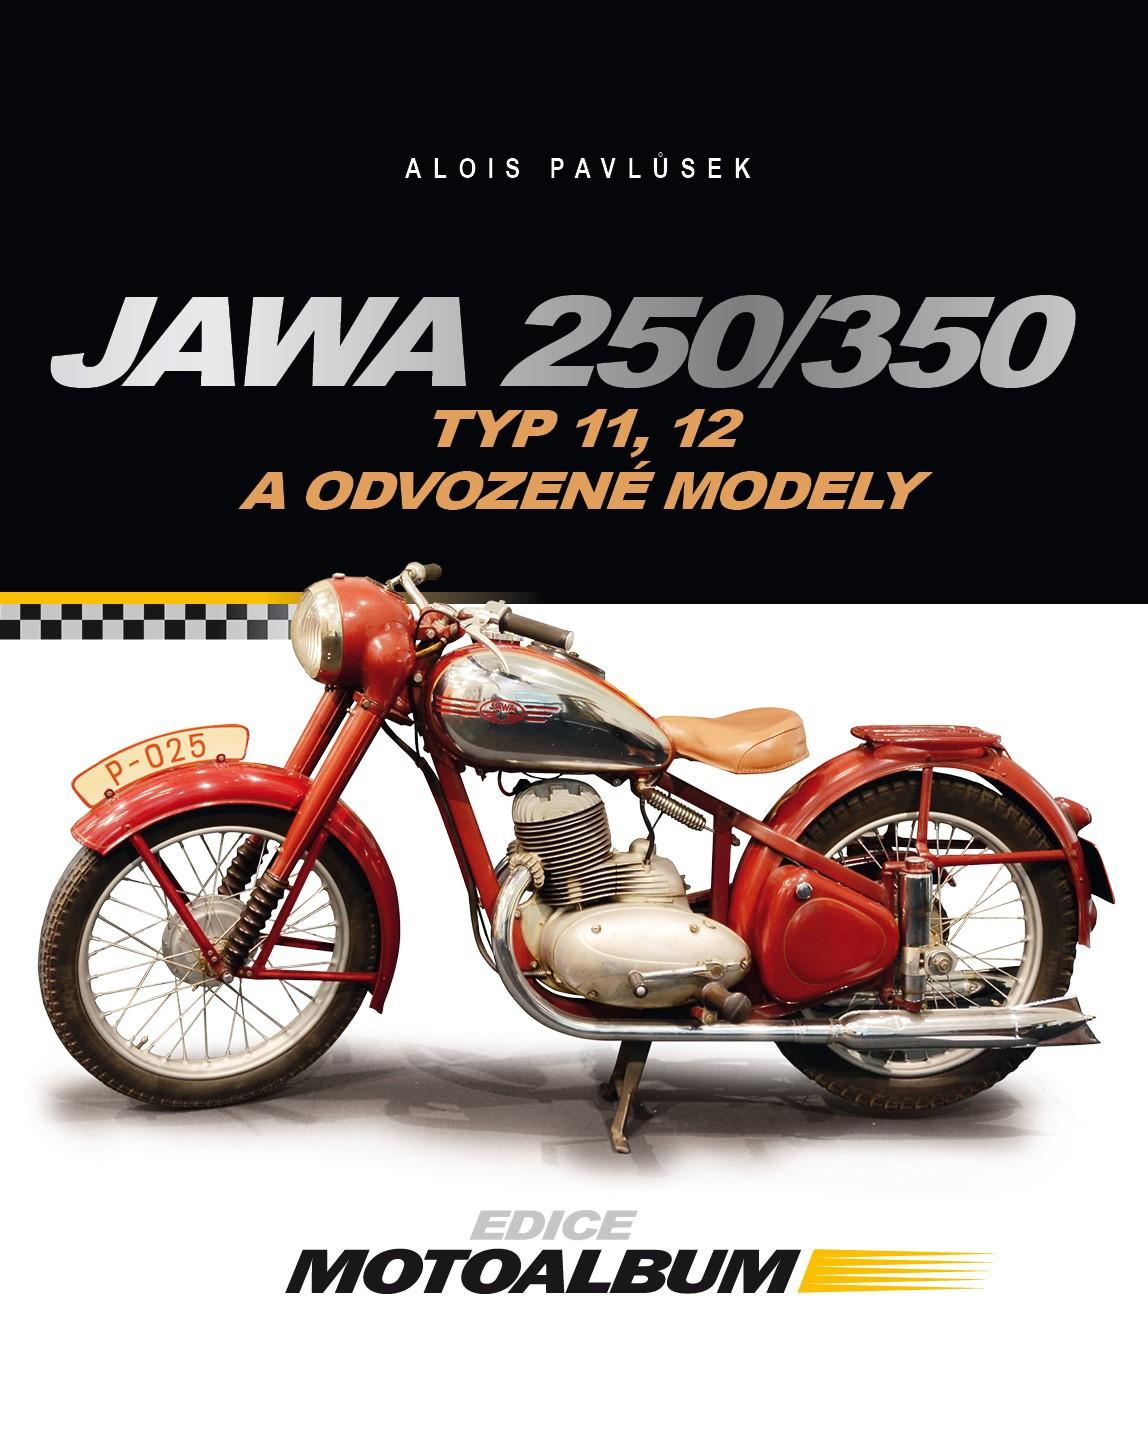 Jawa 250 / 350   Alois Pavlůsek